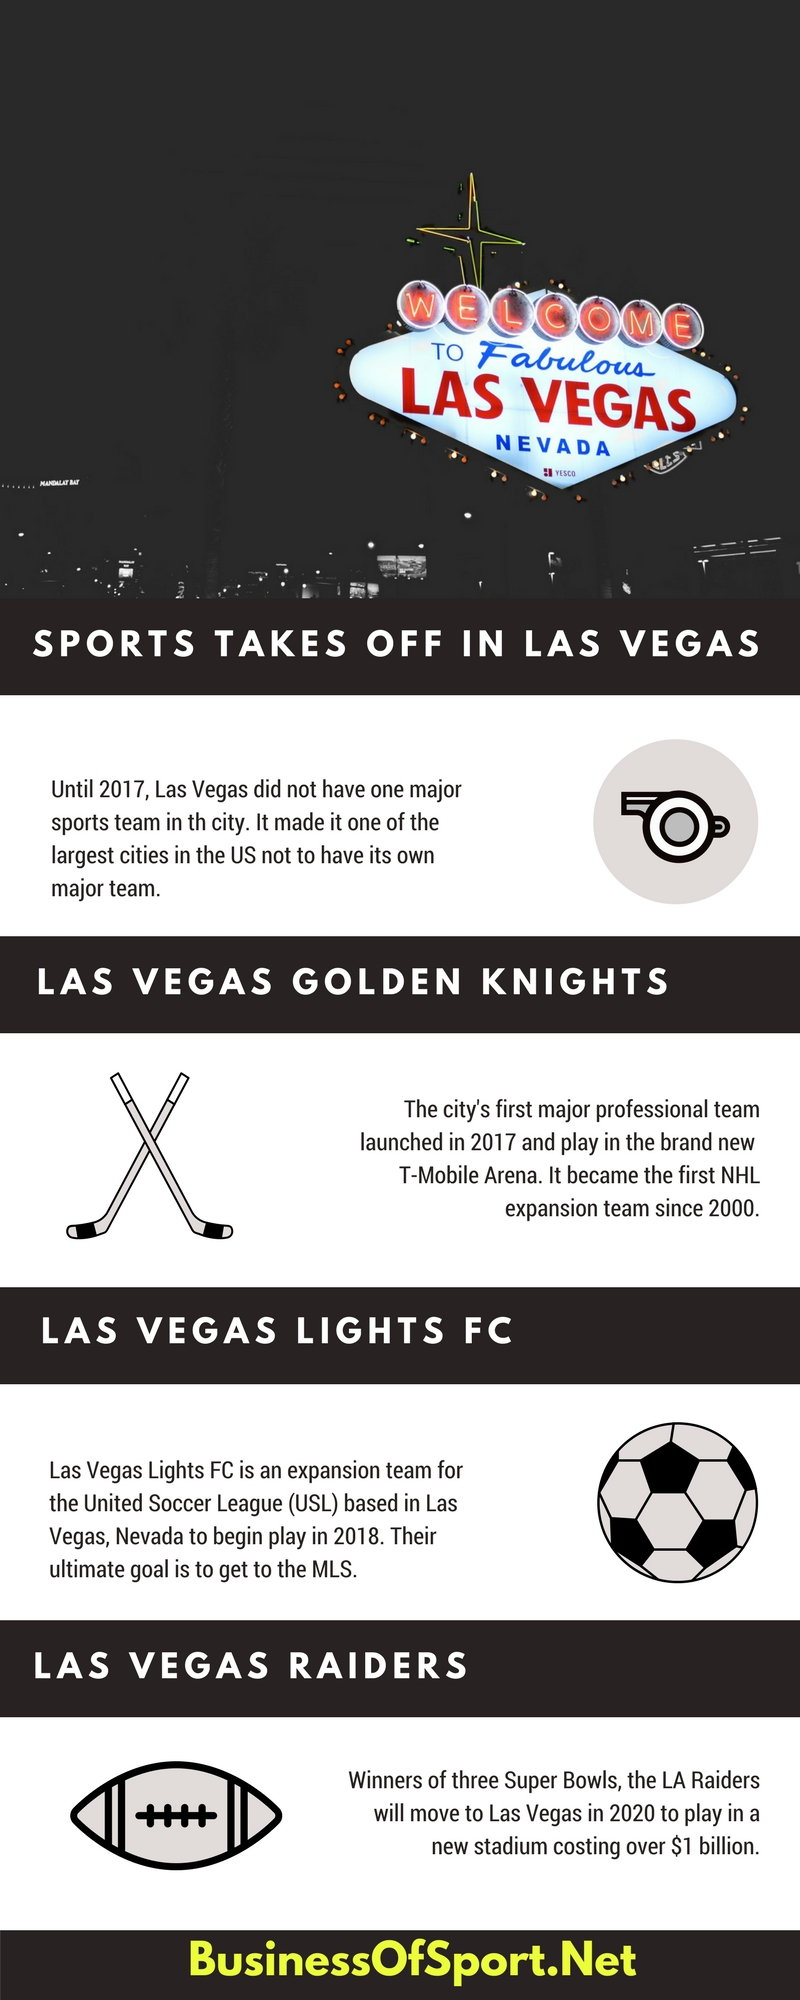 Las Vegas Sports Teams - BusinessOfSport.Net